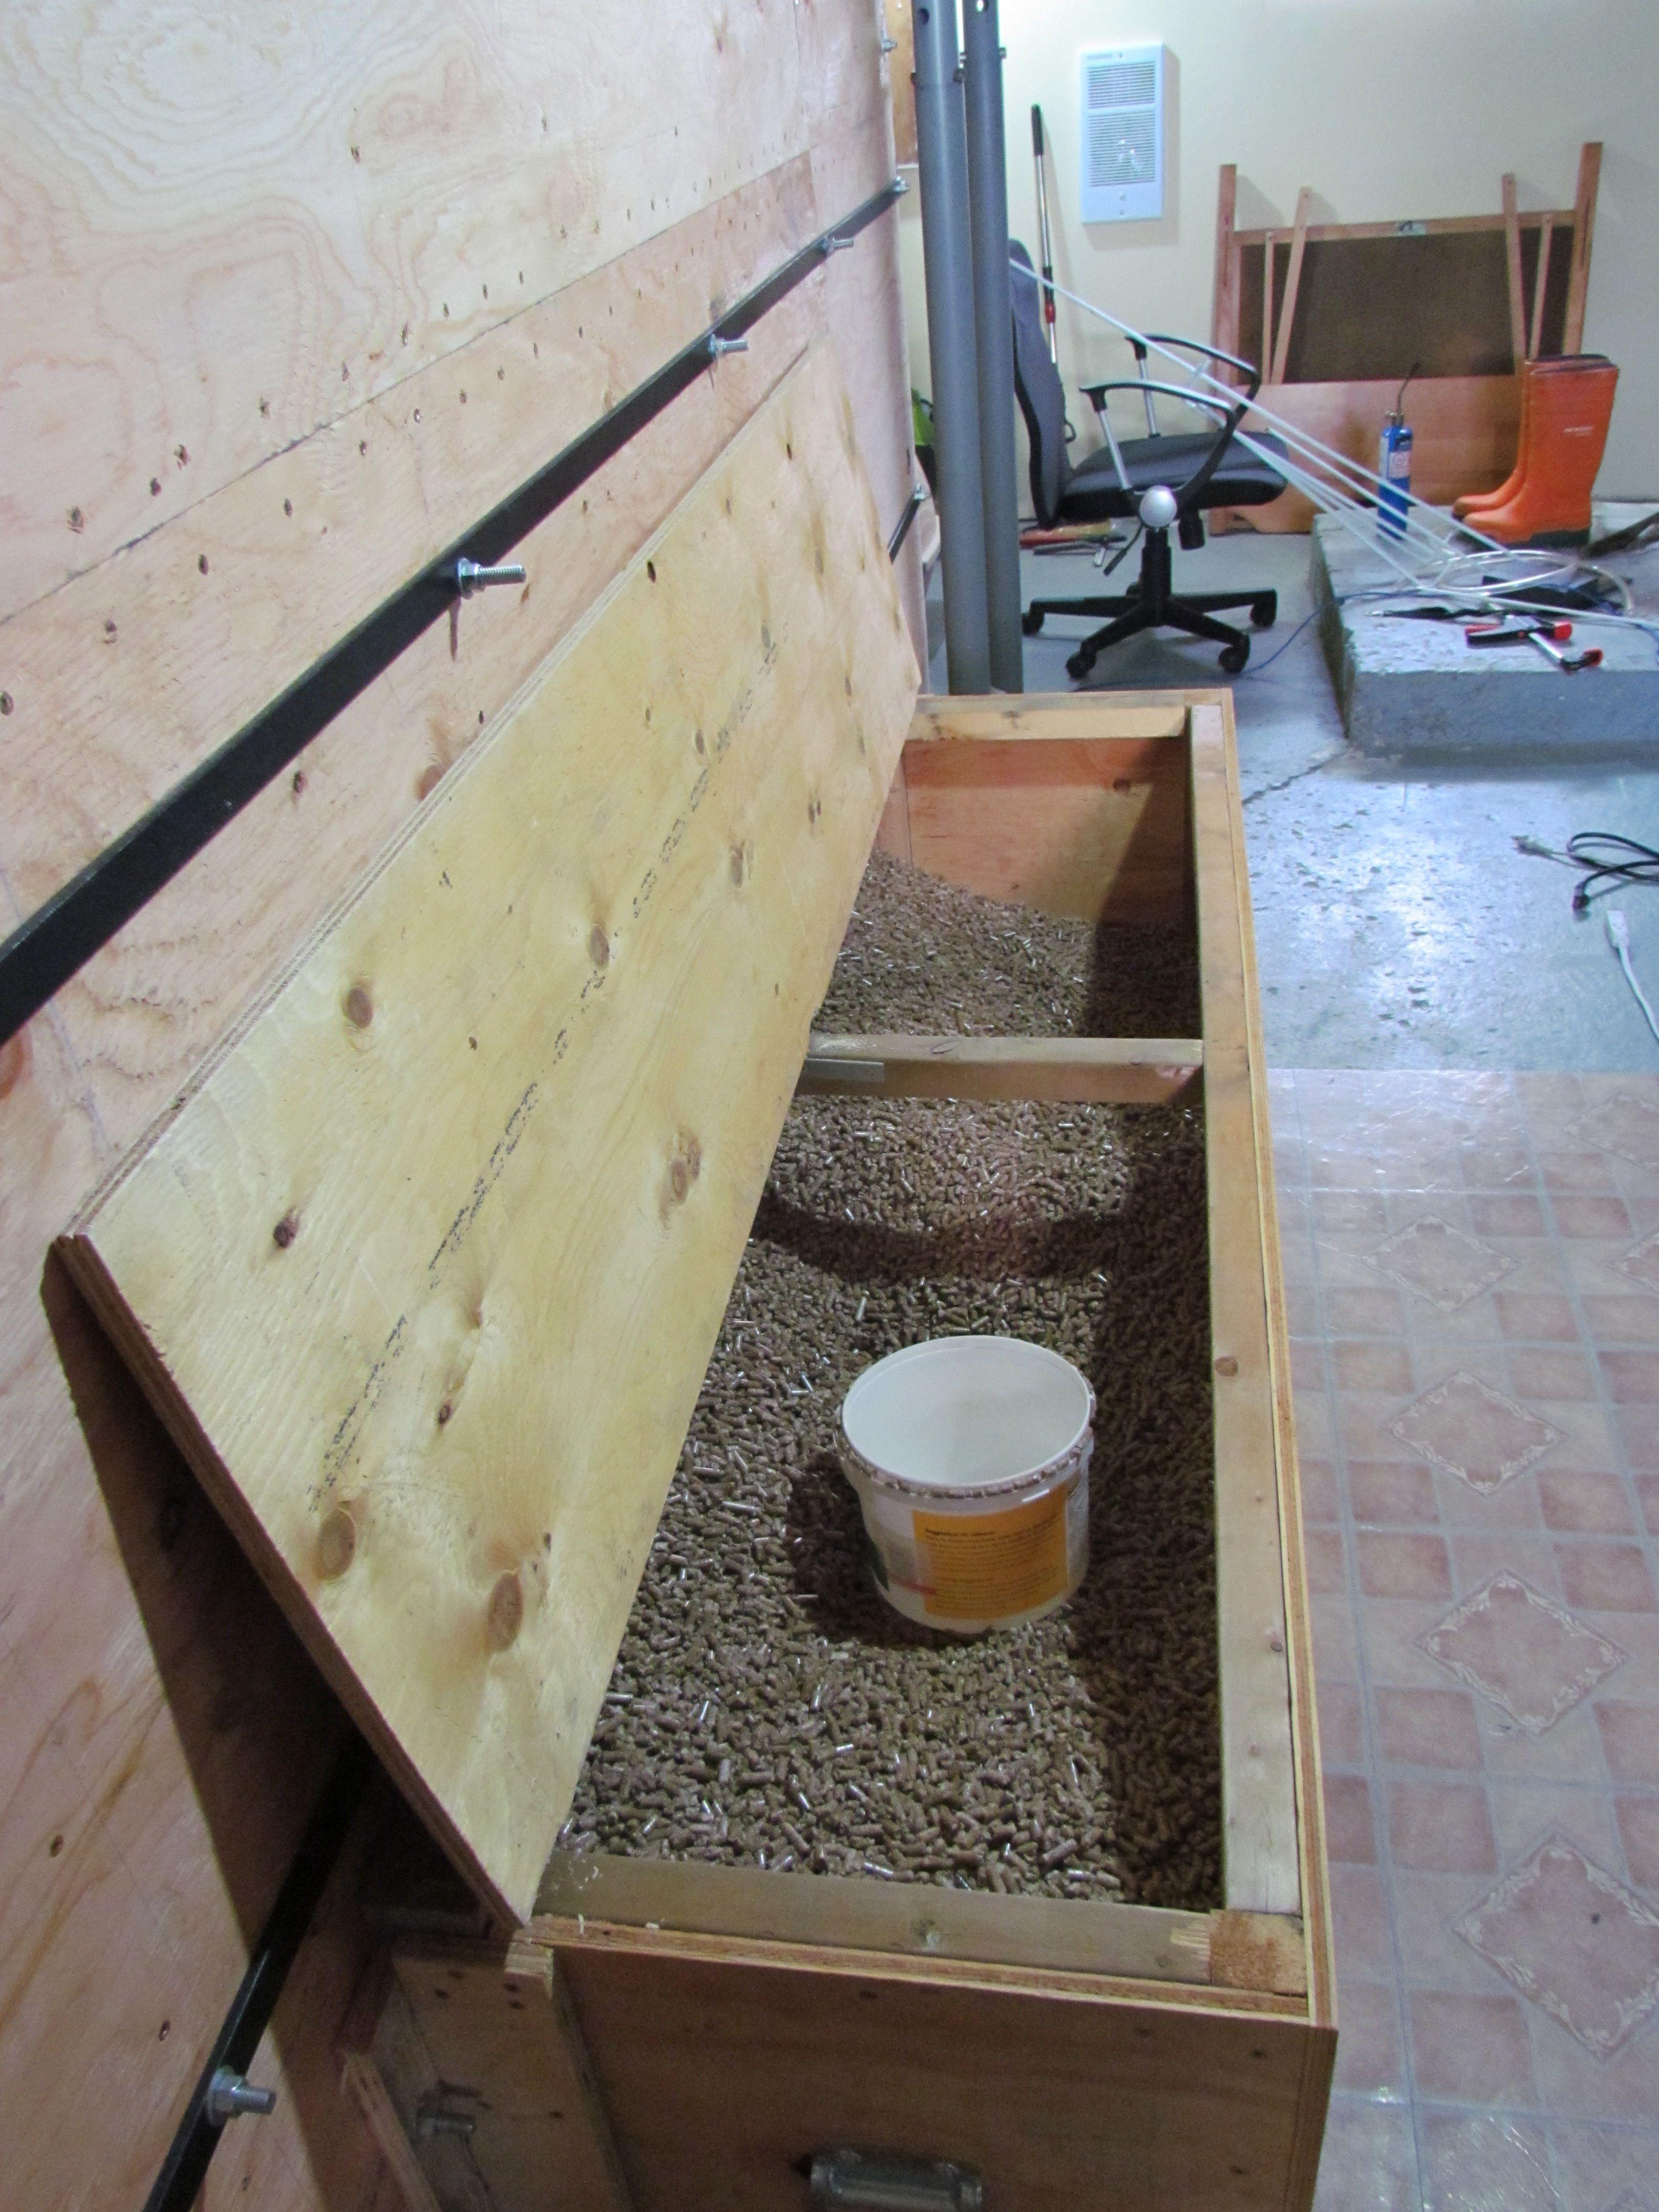 3 5 Ton Bulk Wood Pellet Storage Box Pellet Stove Wood Pellets Corner Wood Stove